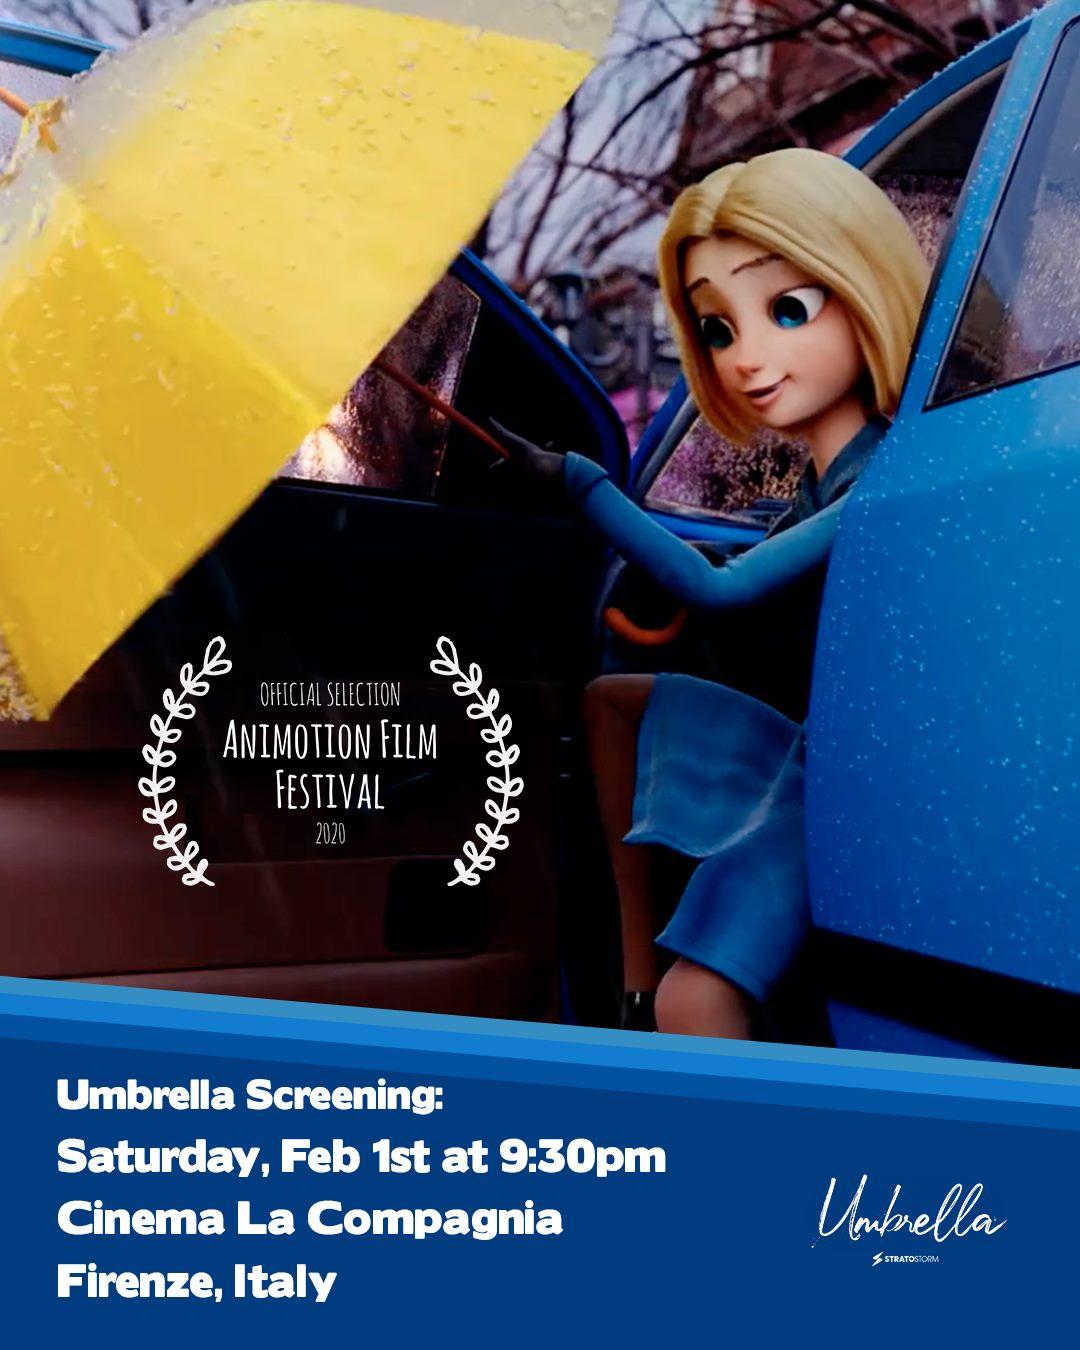 Animotion Film Festival, Saturday